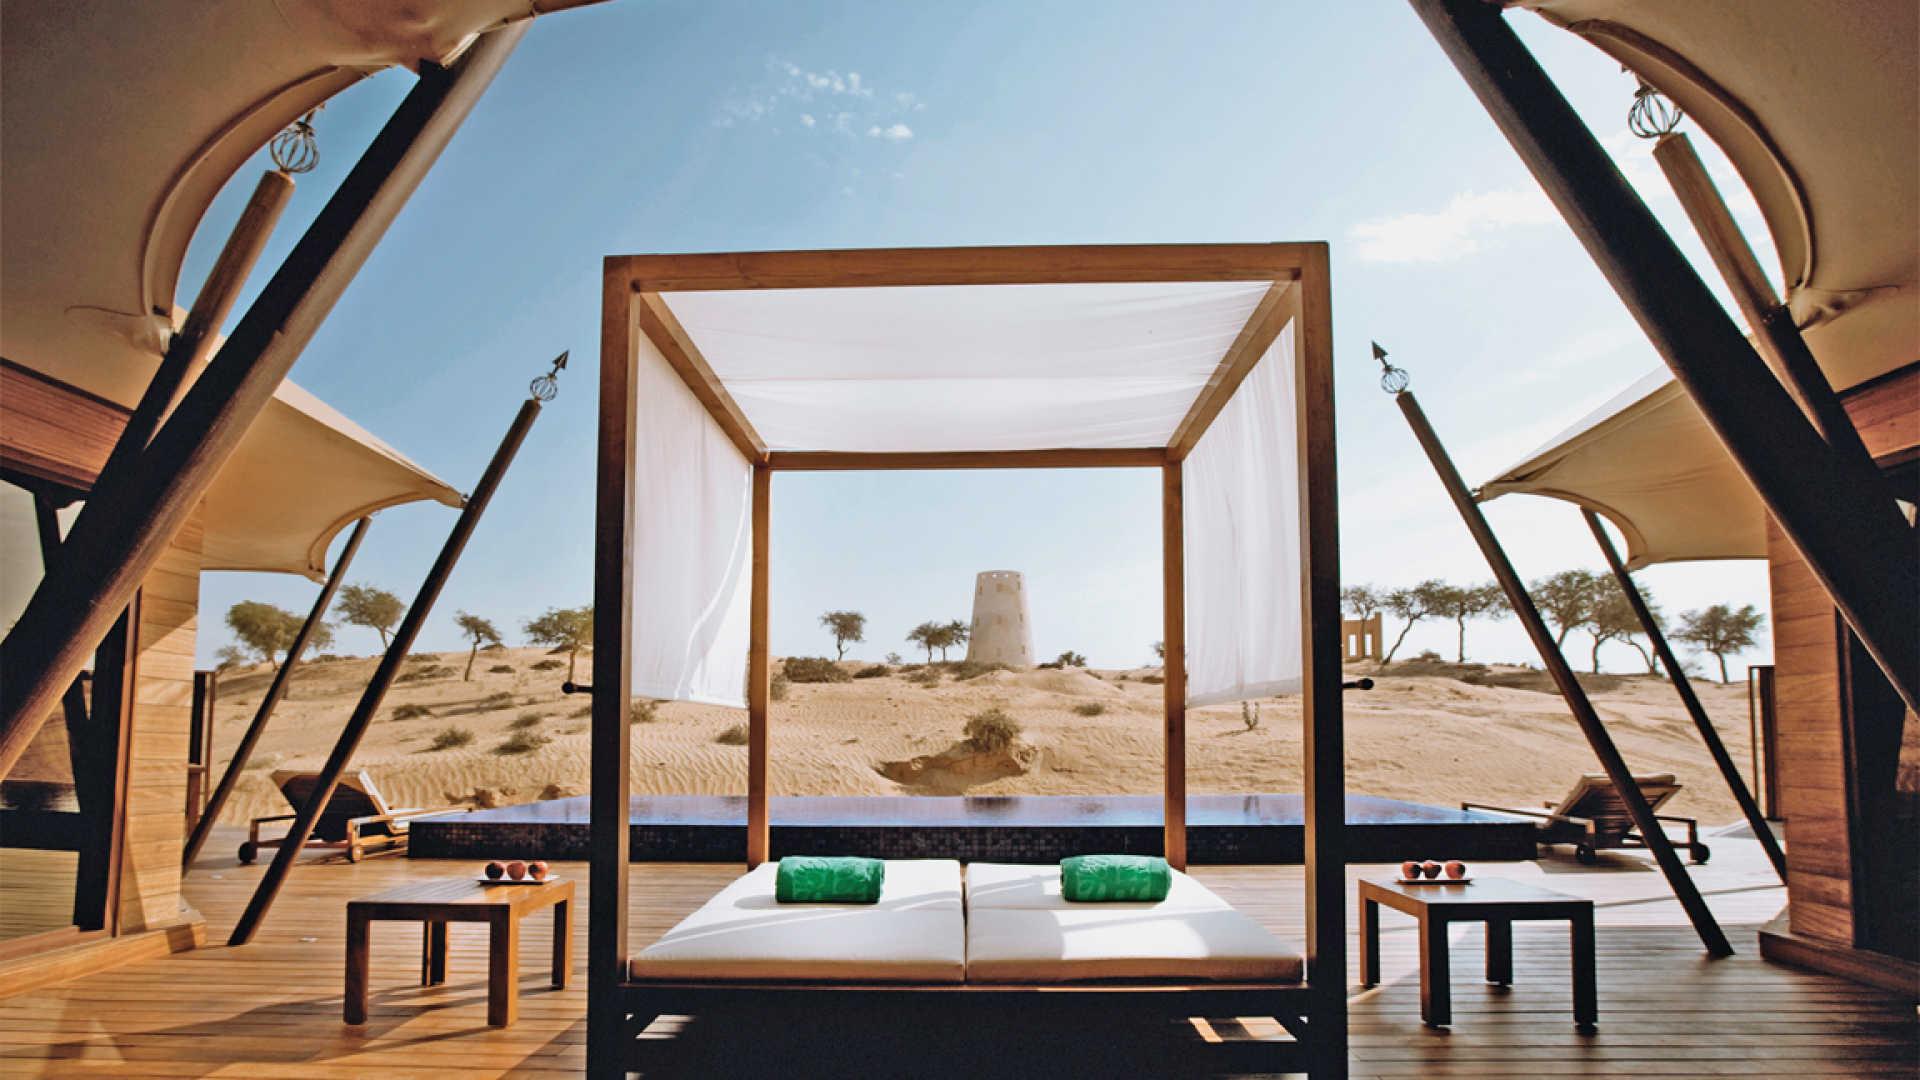 RITZ CARLTON, AL WADI Desert, Ras al Khaimah UAE